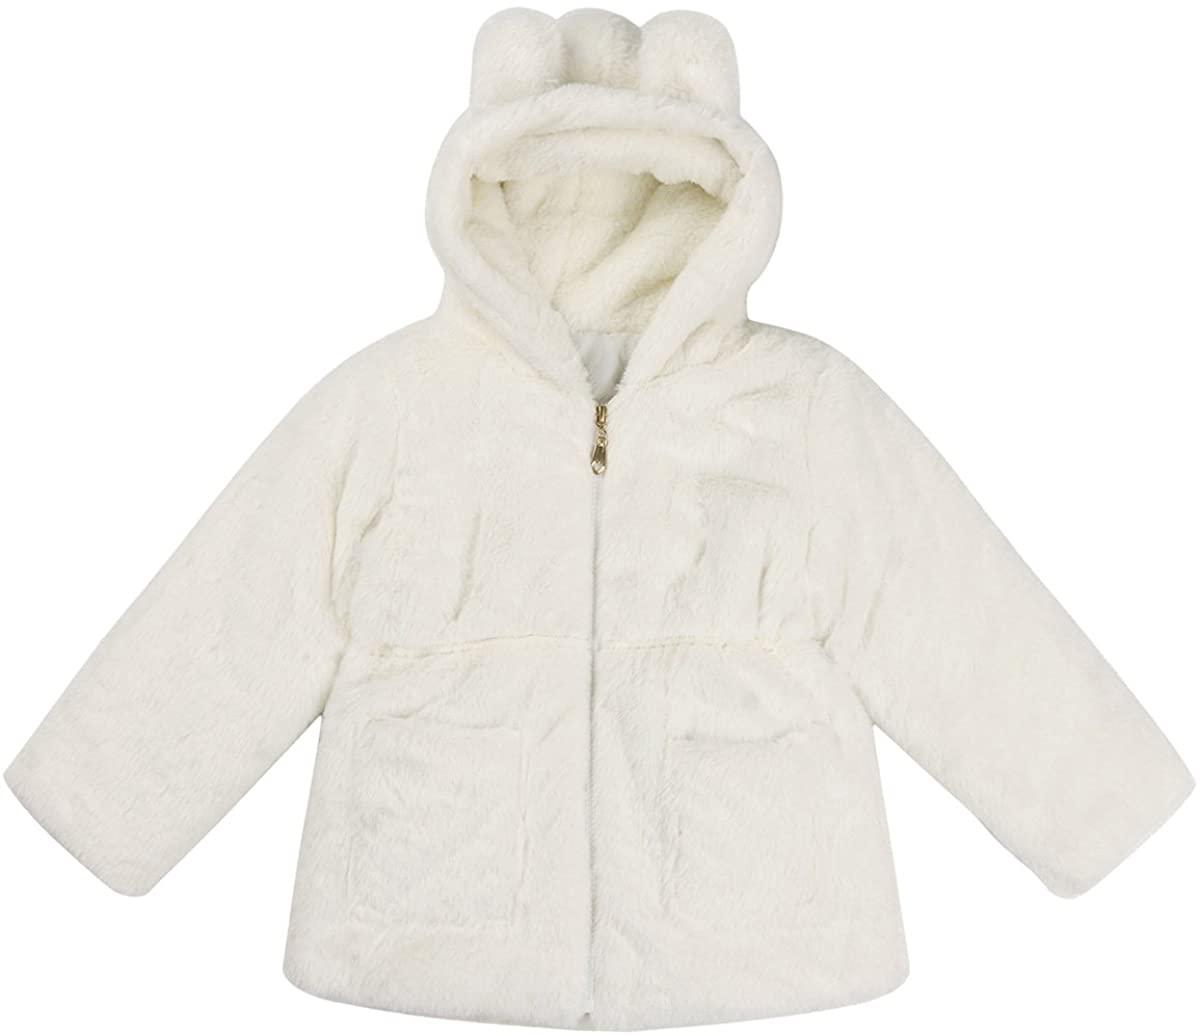 ACSUSS Kids Toddler Girls Long Sleeves Faux Fur Ear Hooded Fleece Lapel Jacket Coats